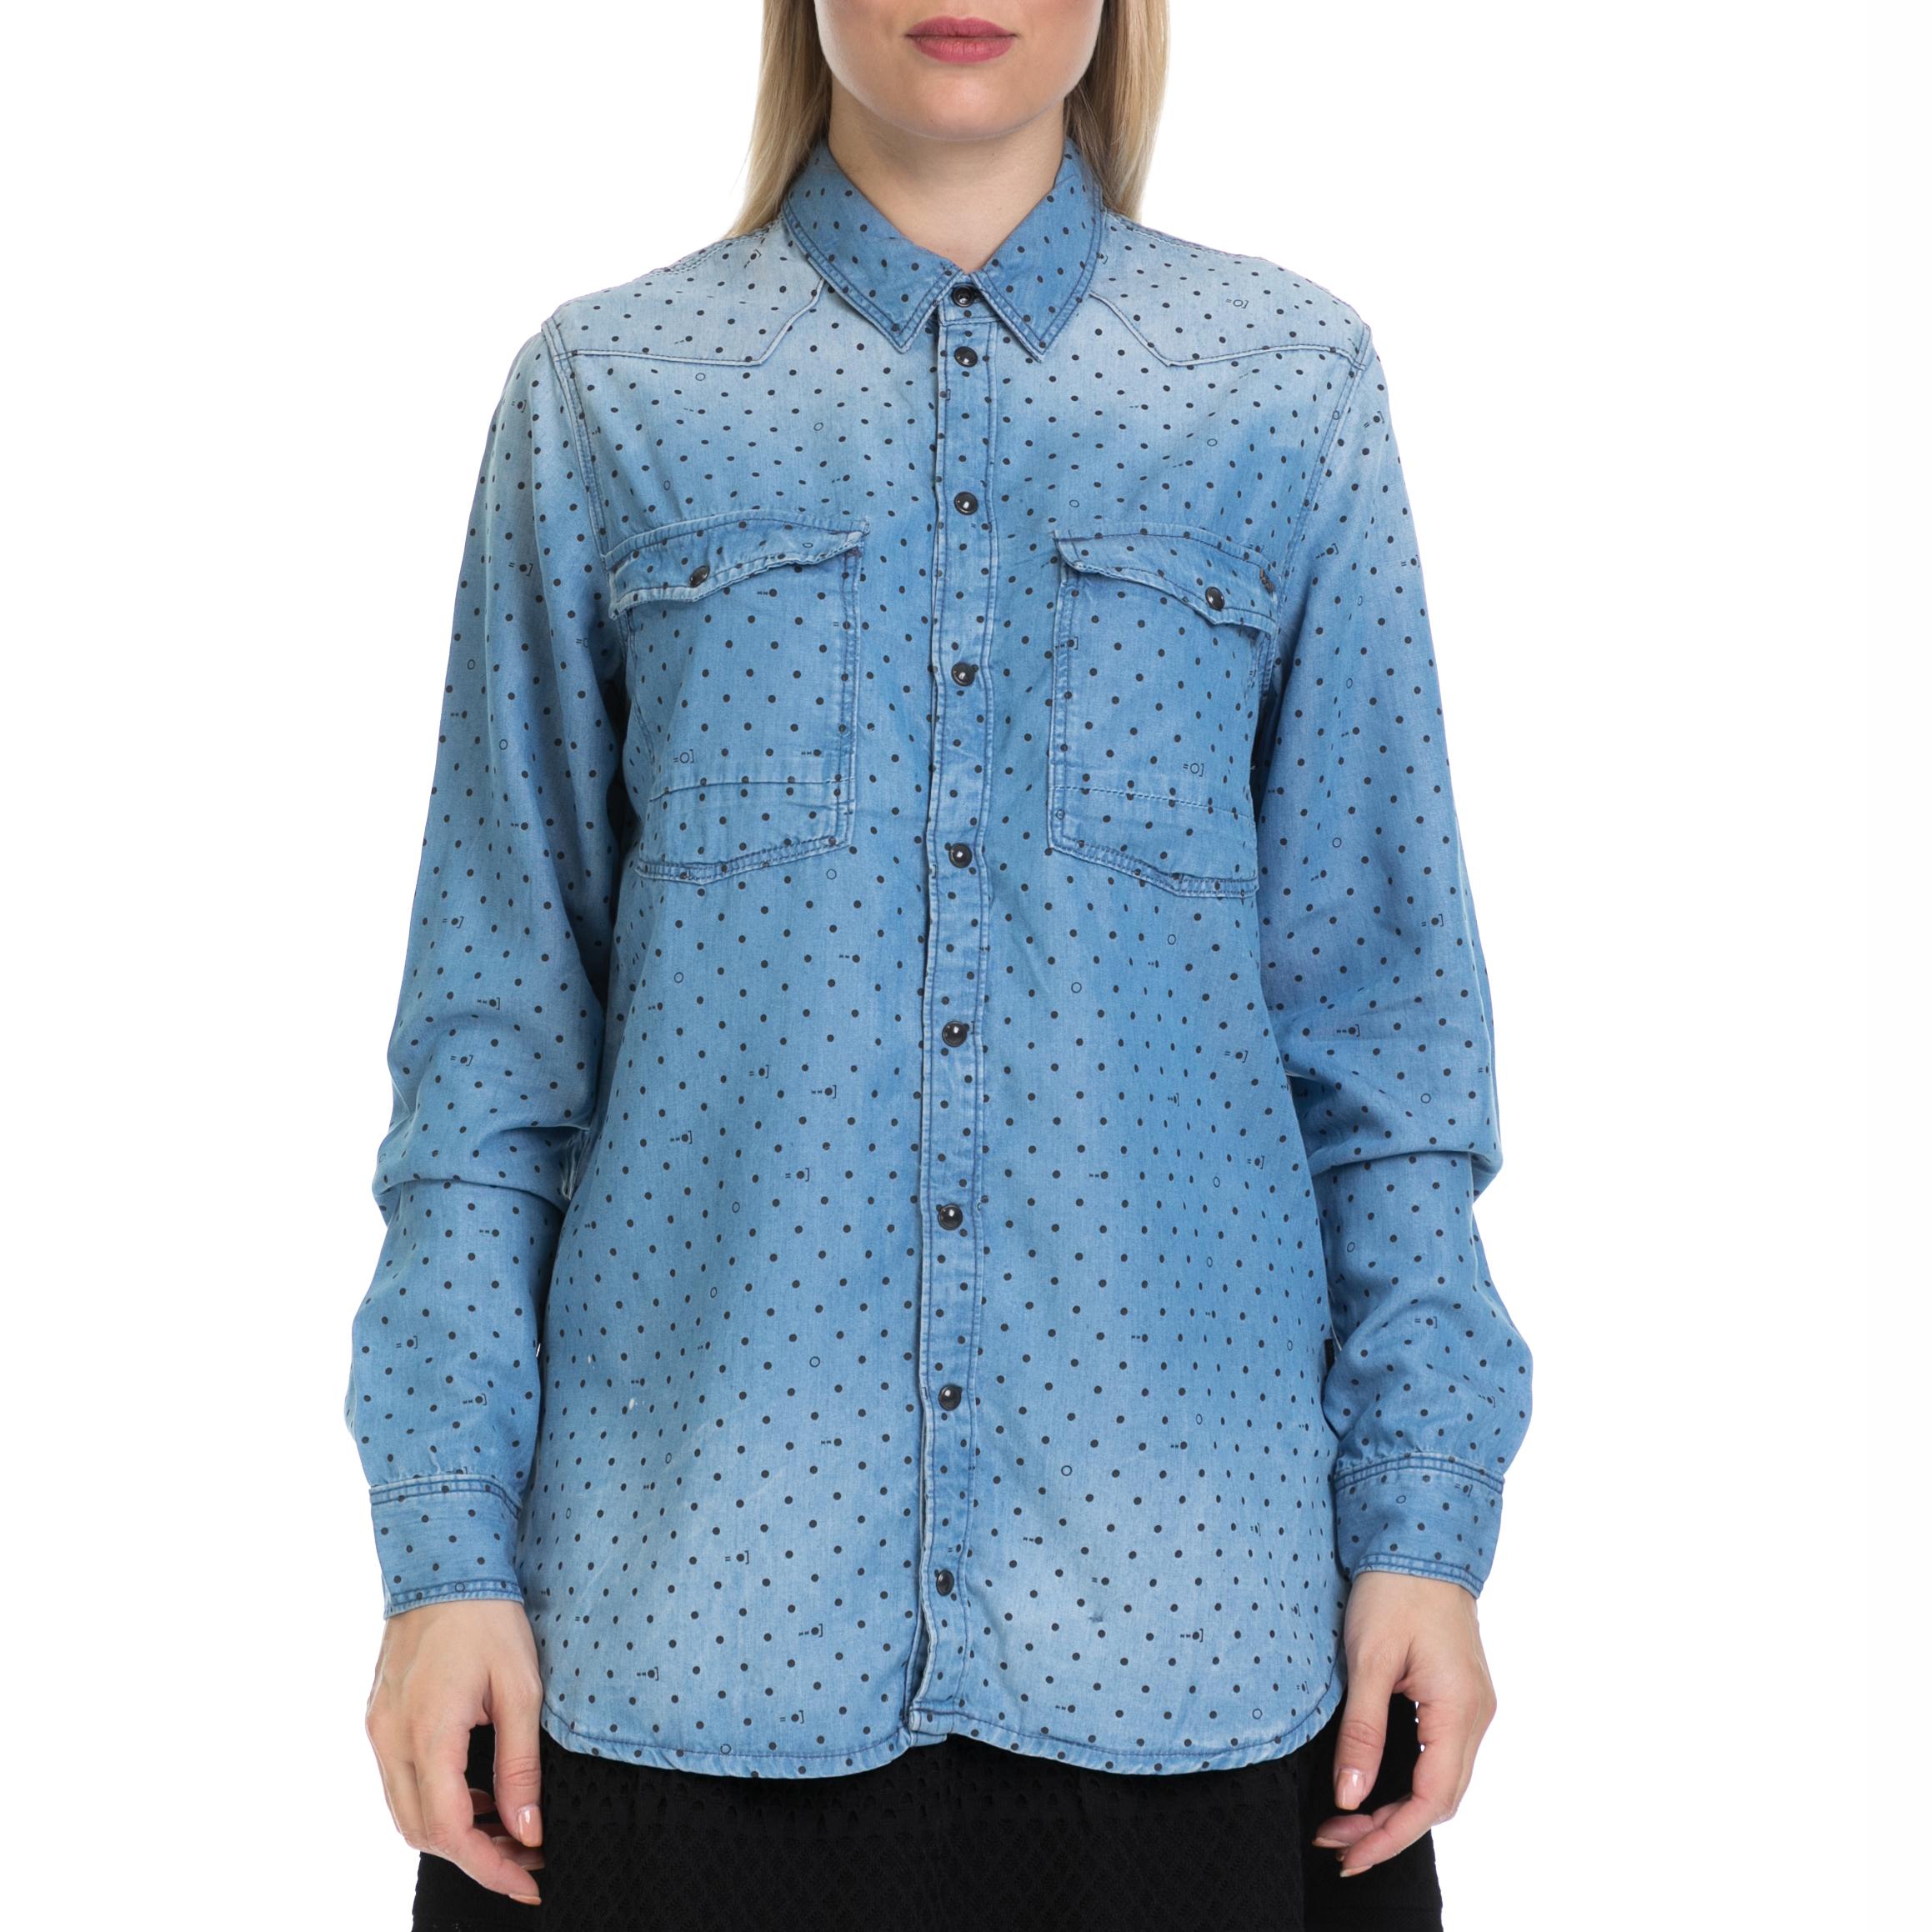 G-STAR – Γυναικείο τζιν πουκάμισο G-STAR μπλε